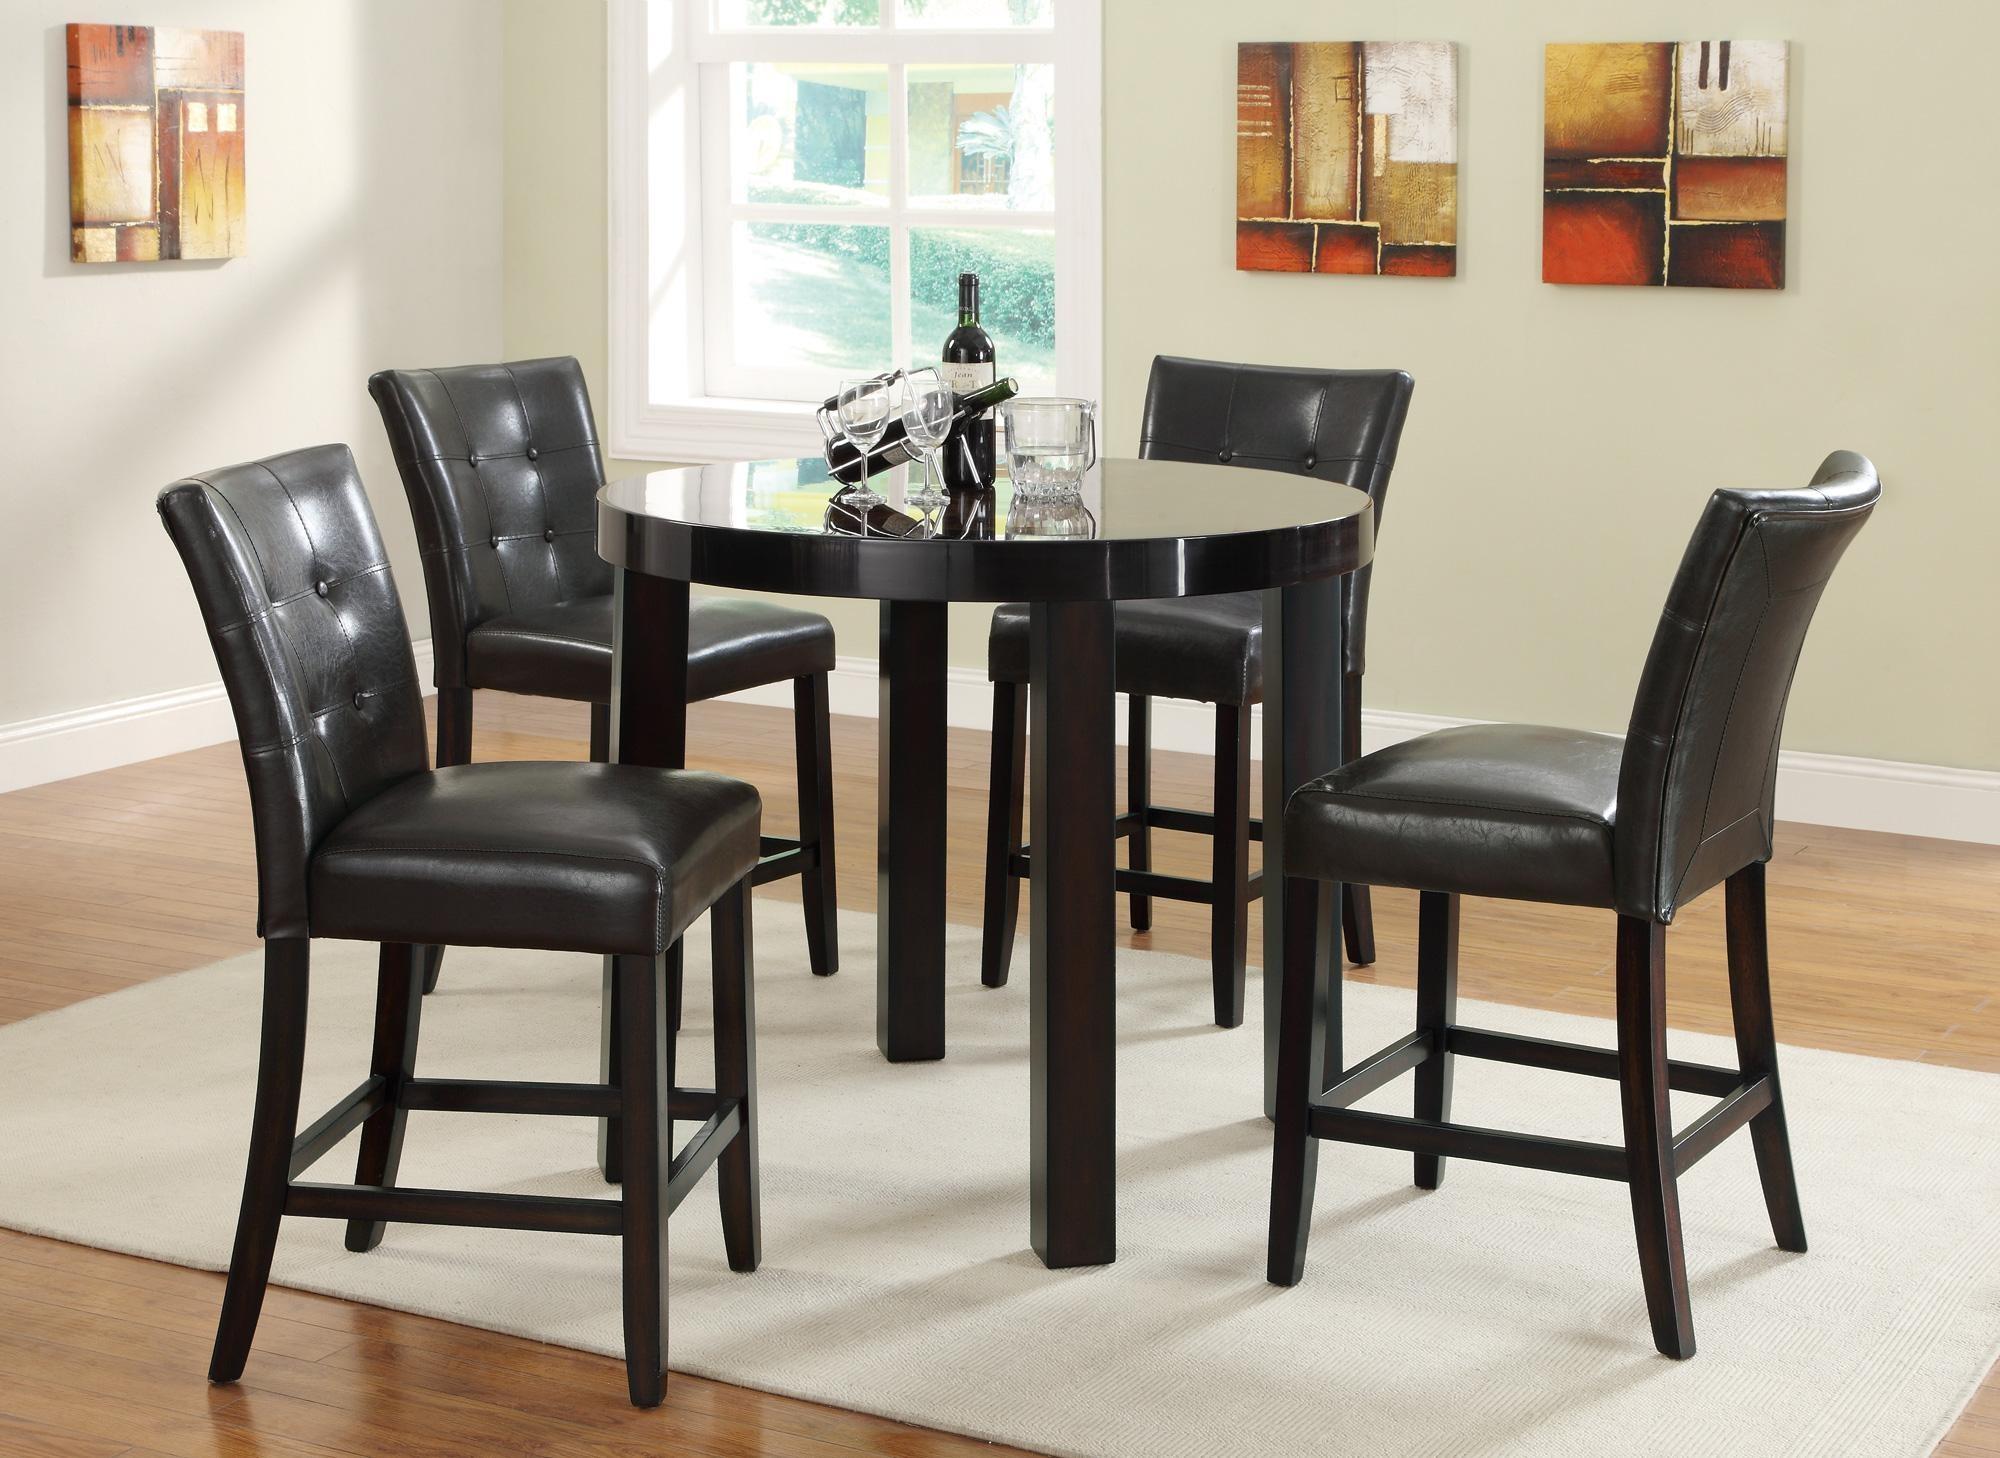 orlando round counter height dining room set 103798 coaster